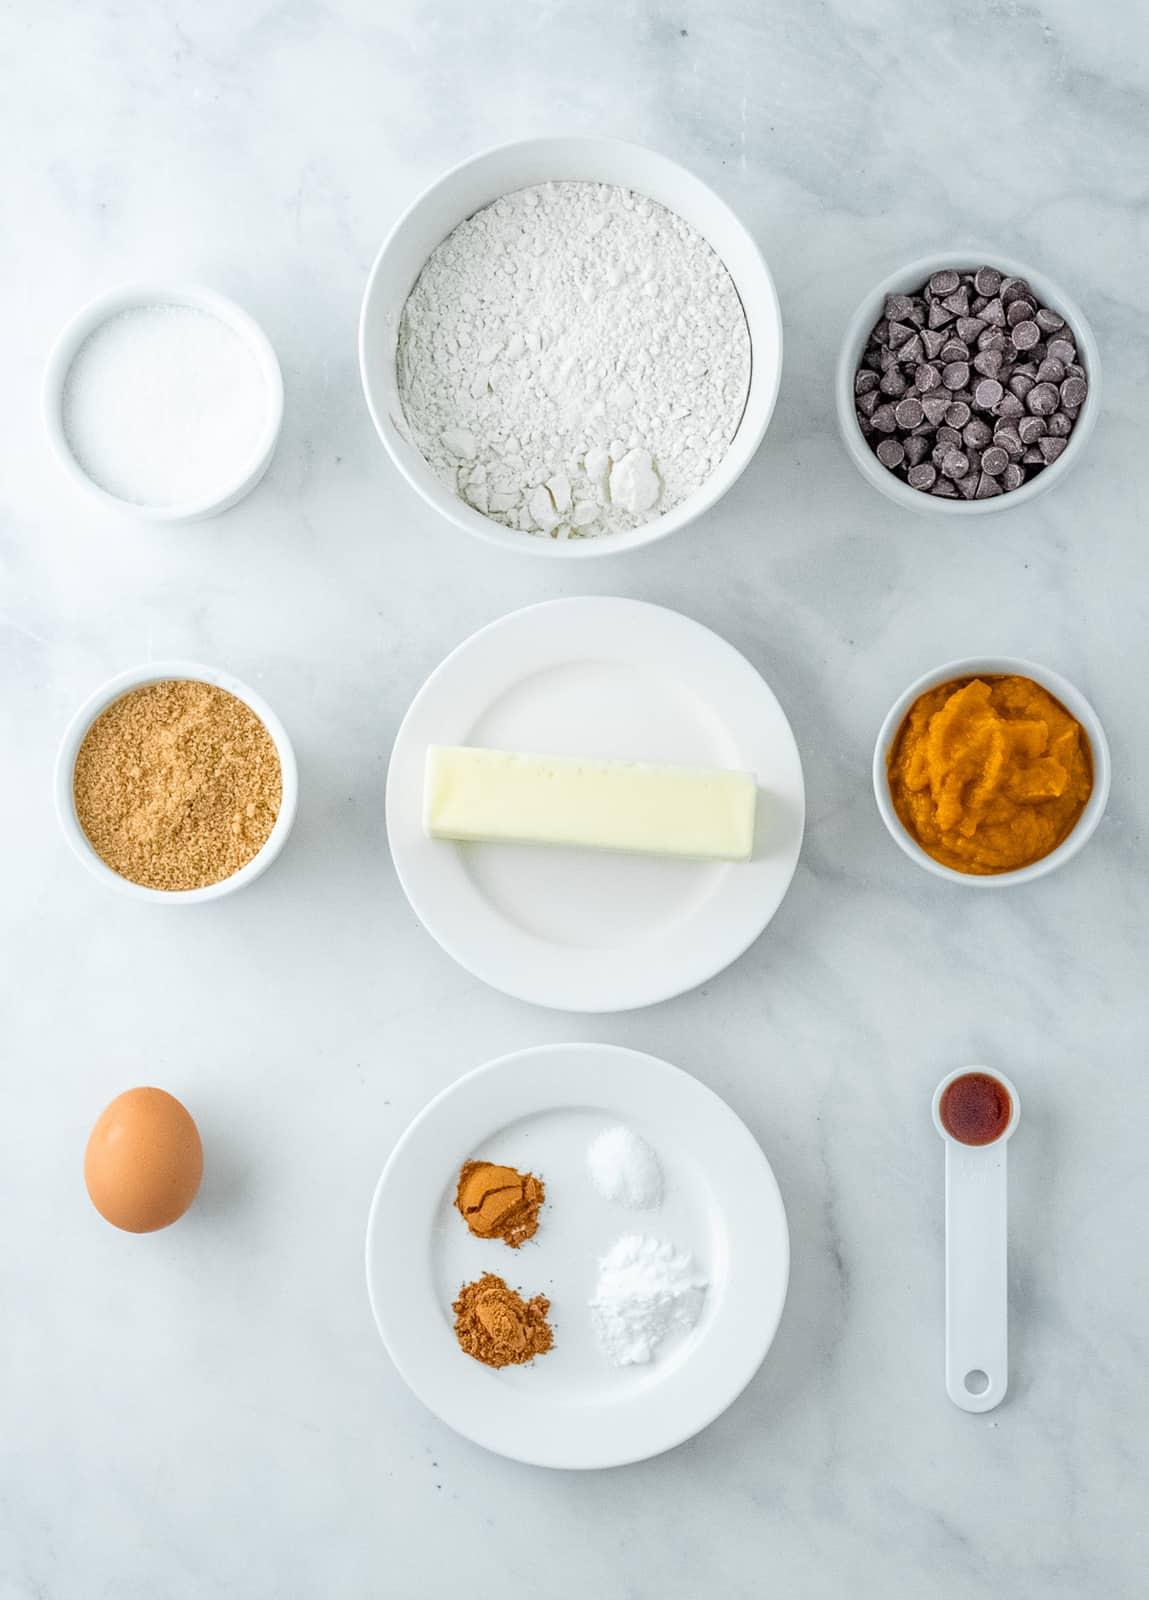 Ingredients needed to make Pumpkin Chocolate Chip Cookies.